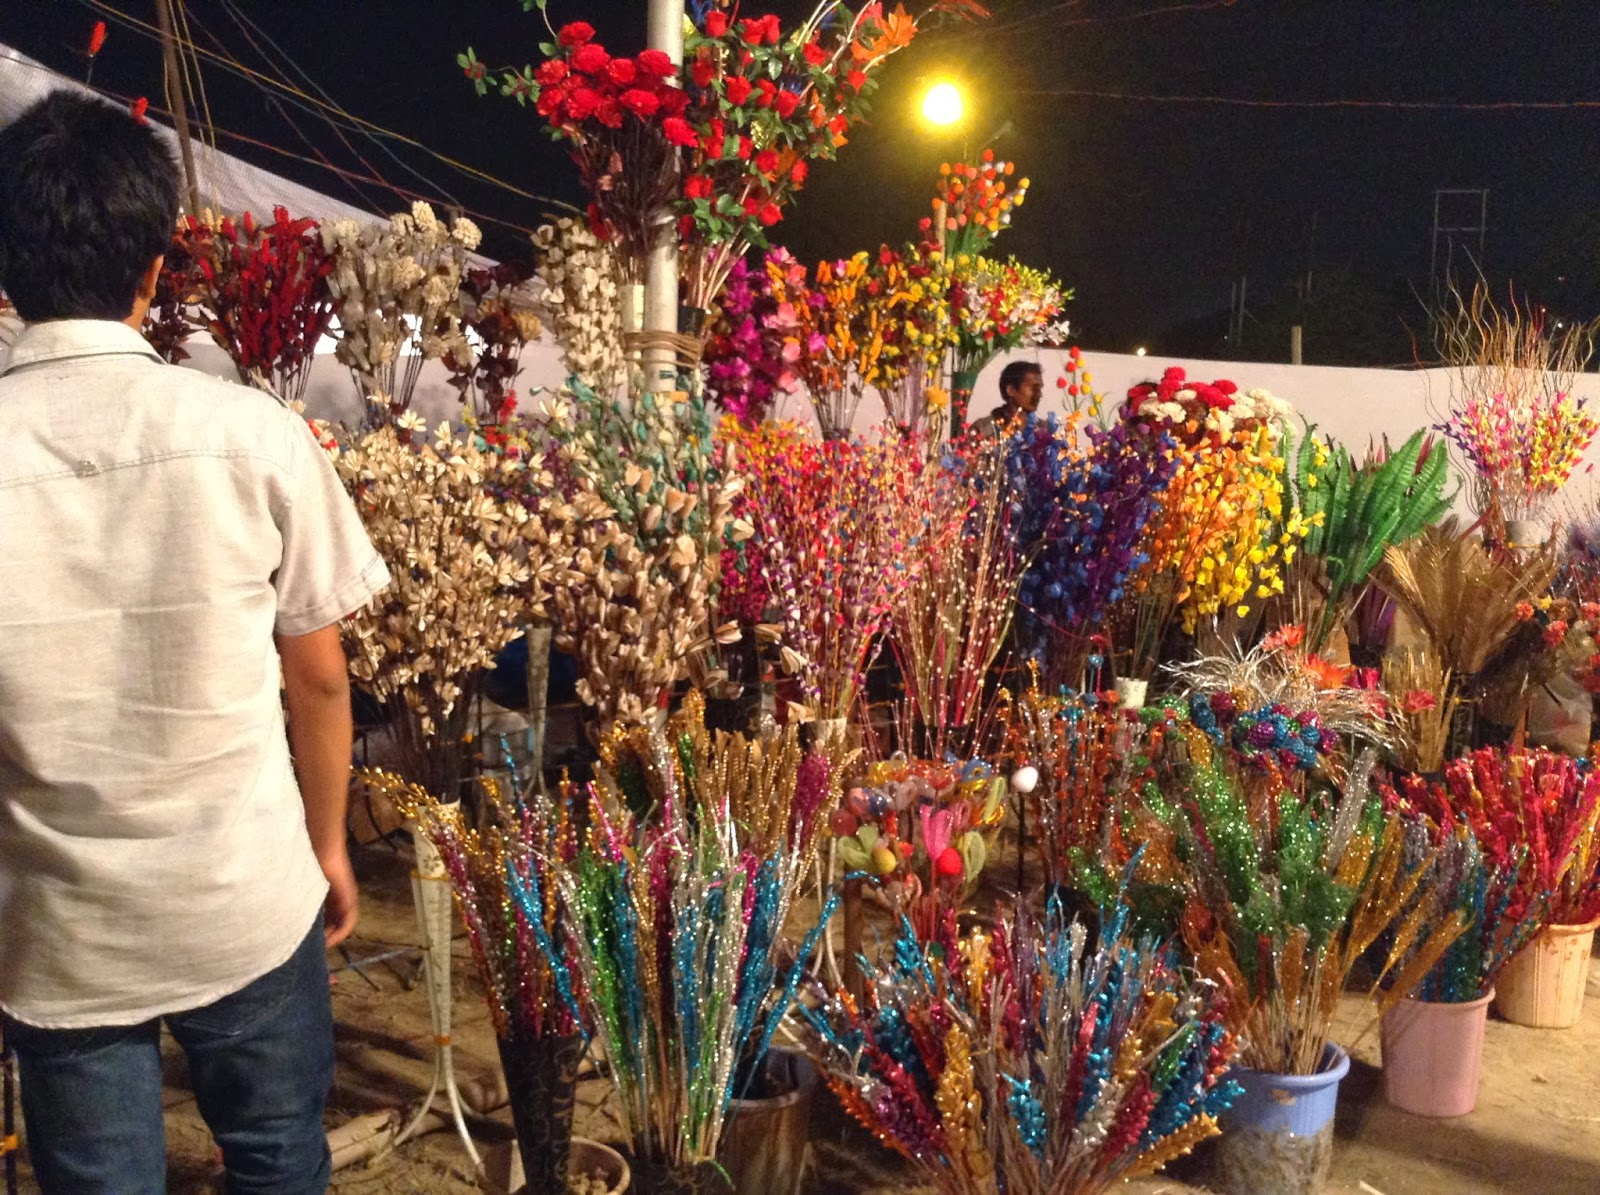 Decorative Flower Stall at Deep Utsav 2013, Noida